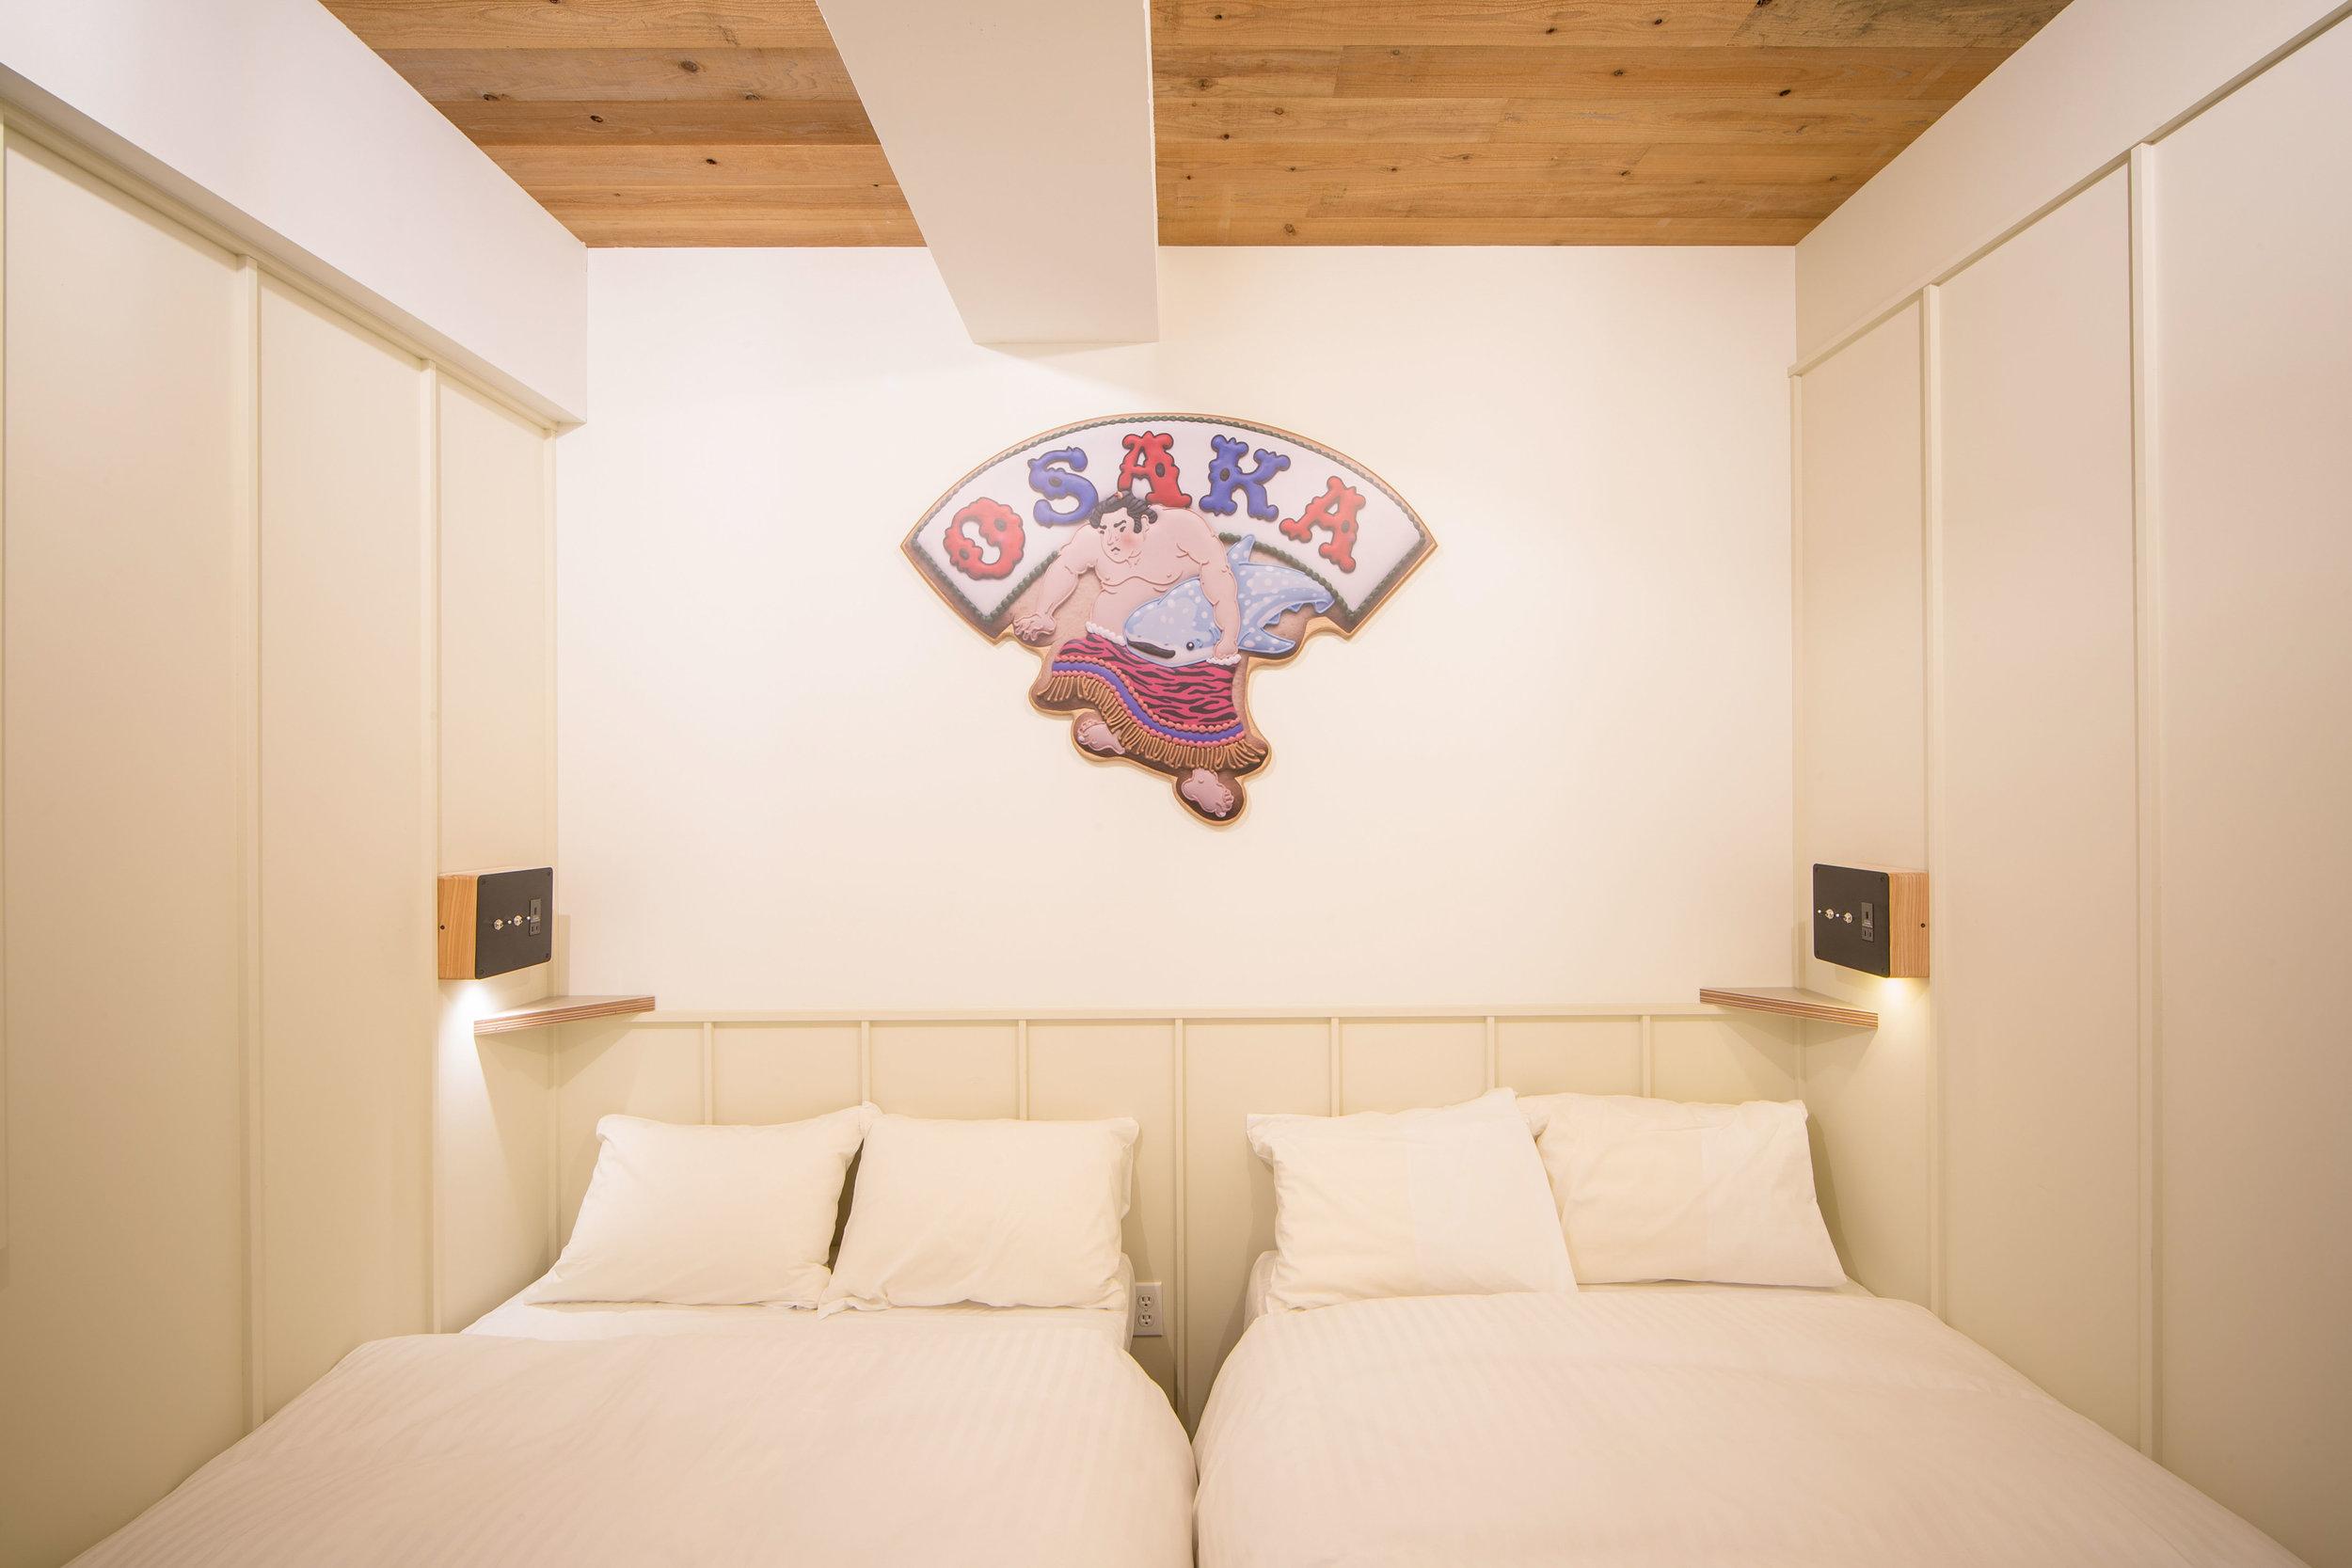 Cookieboy`s art work are up on Kamon Hotel in Sennichimae / Osaka.